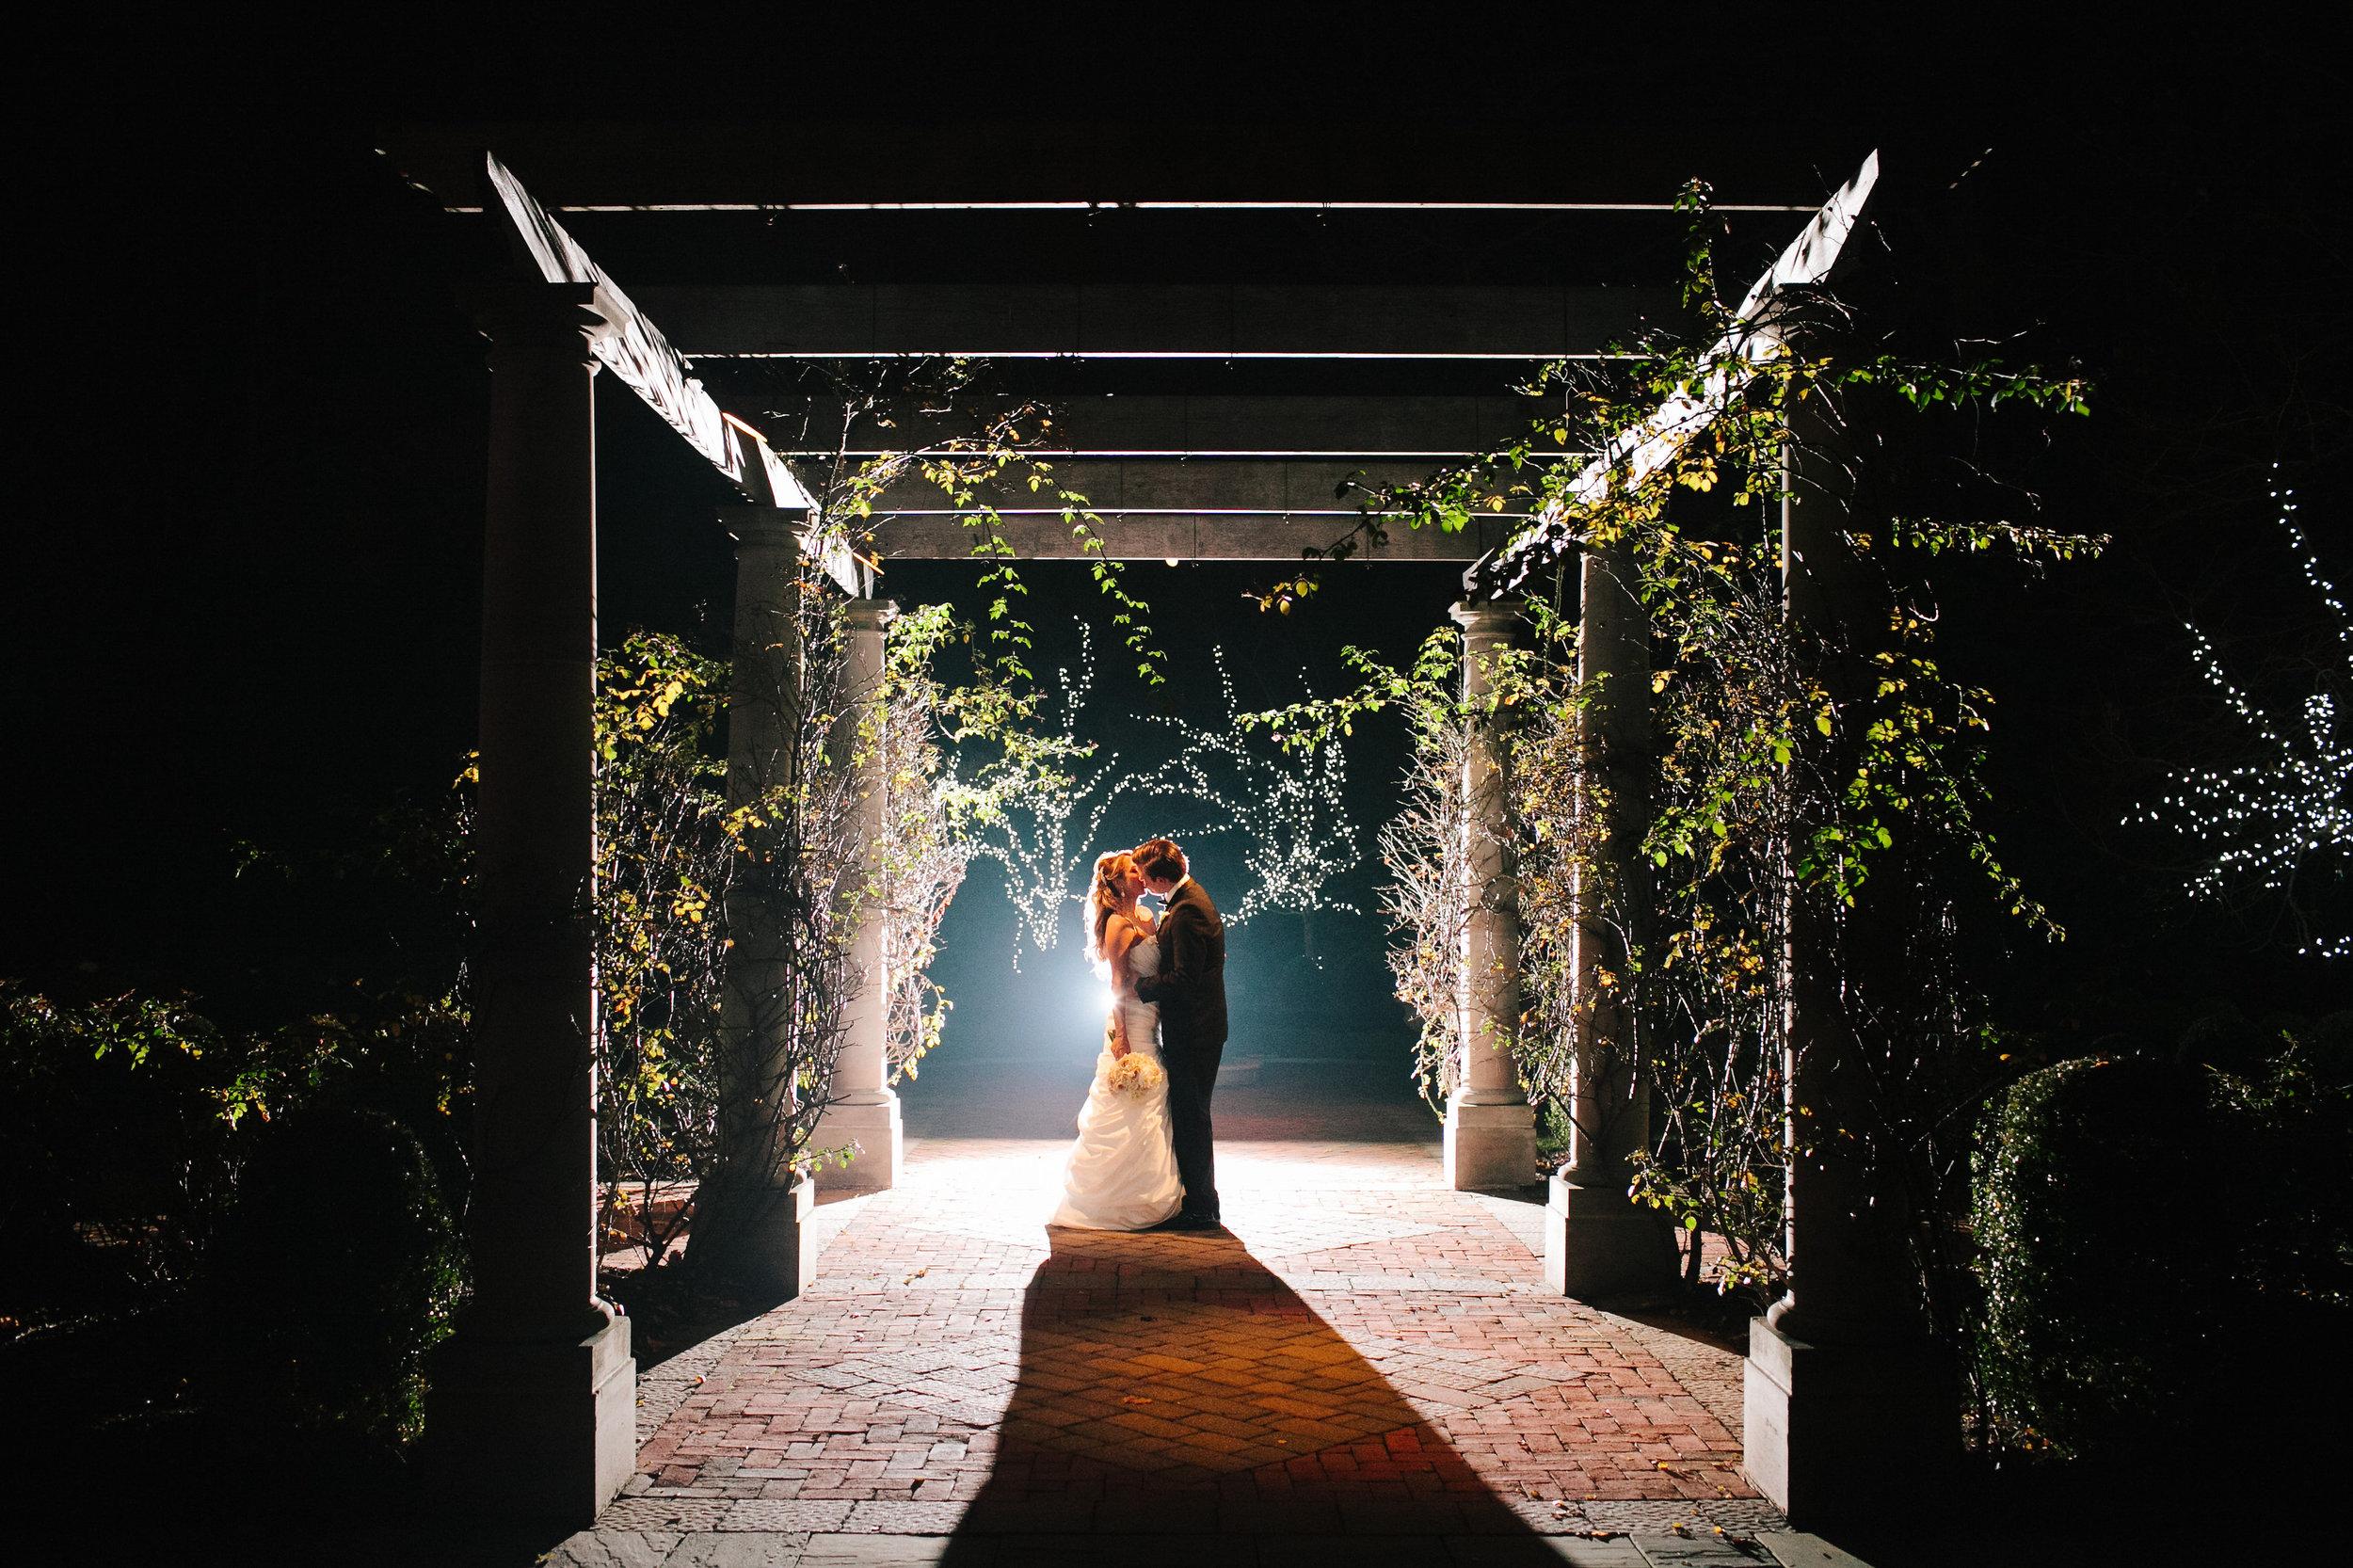 Ceci_New_York_Custom_Invitation_ New_Jersey_Wedding_Luxury_Personalized_Ceci_Style_Bride_Foil_Stamping174.JPG